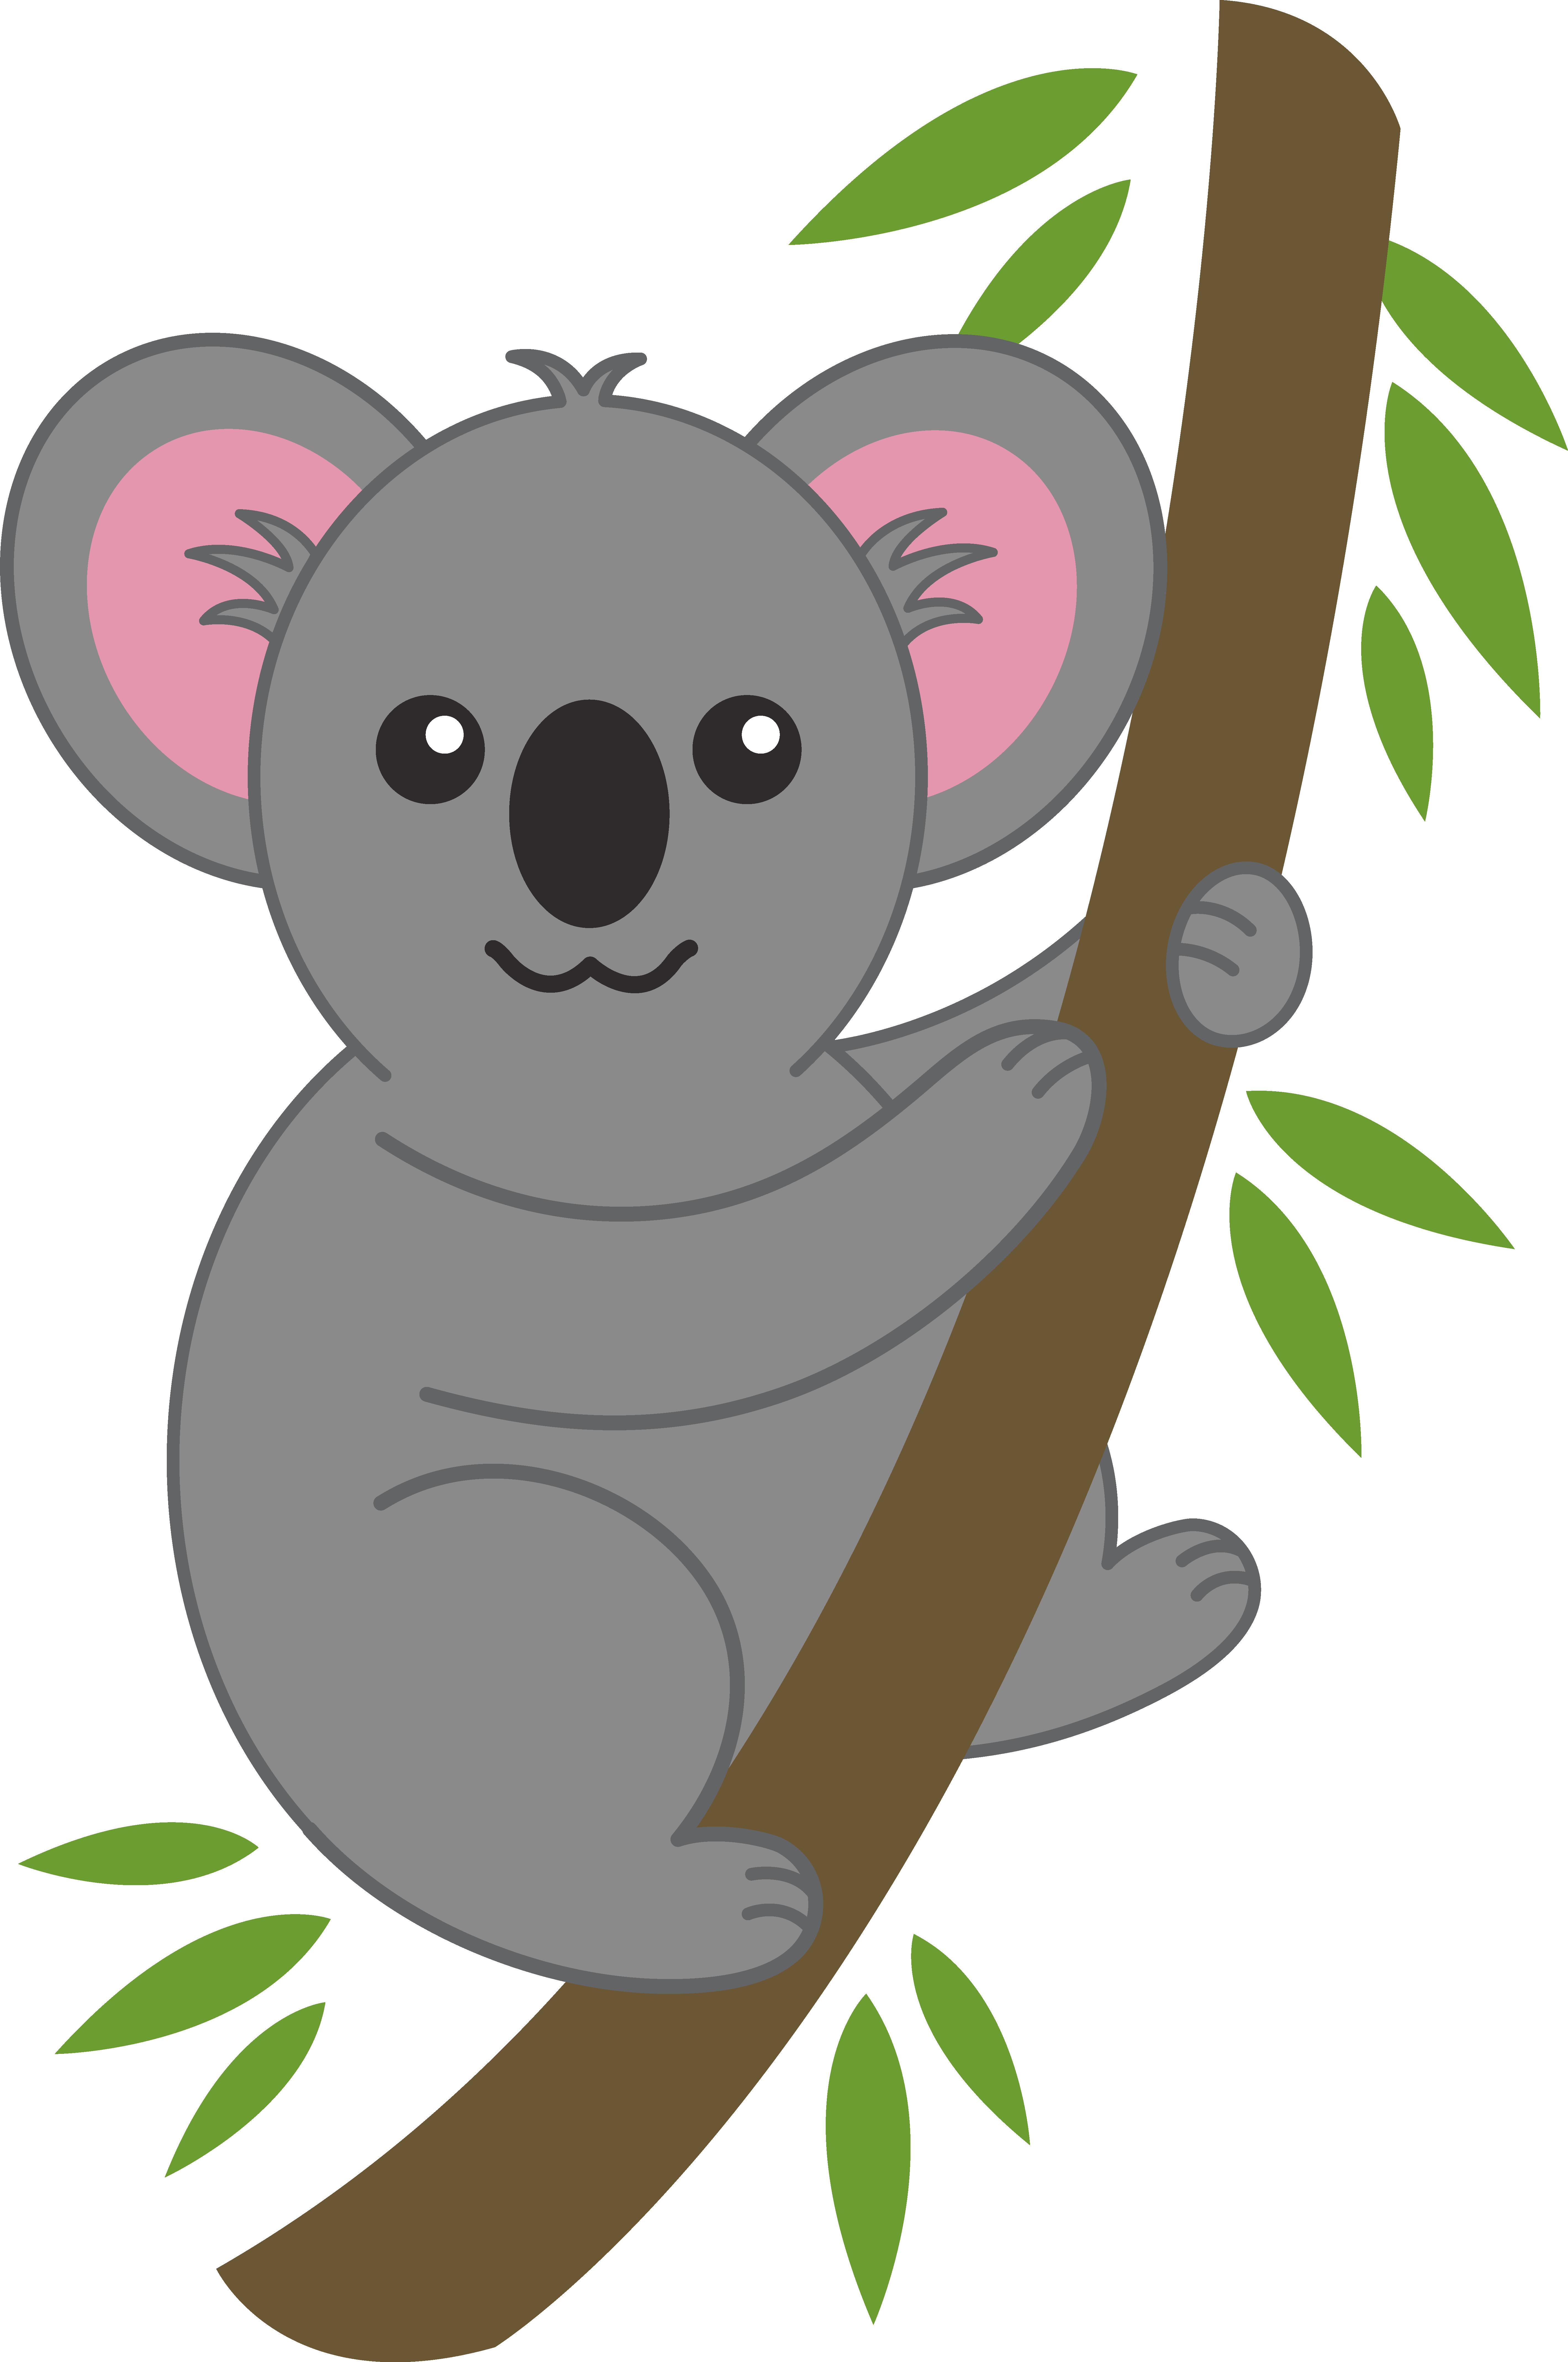 Koala Bear clipart #1, Download drawings